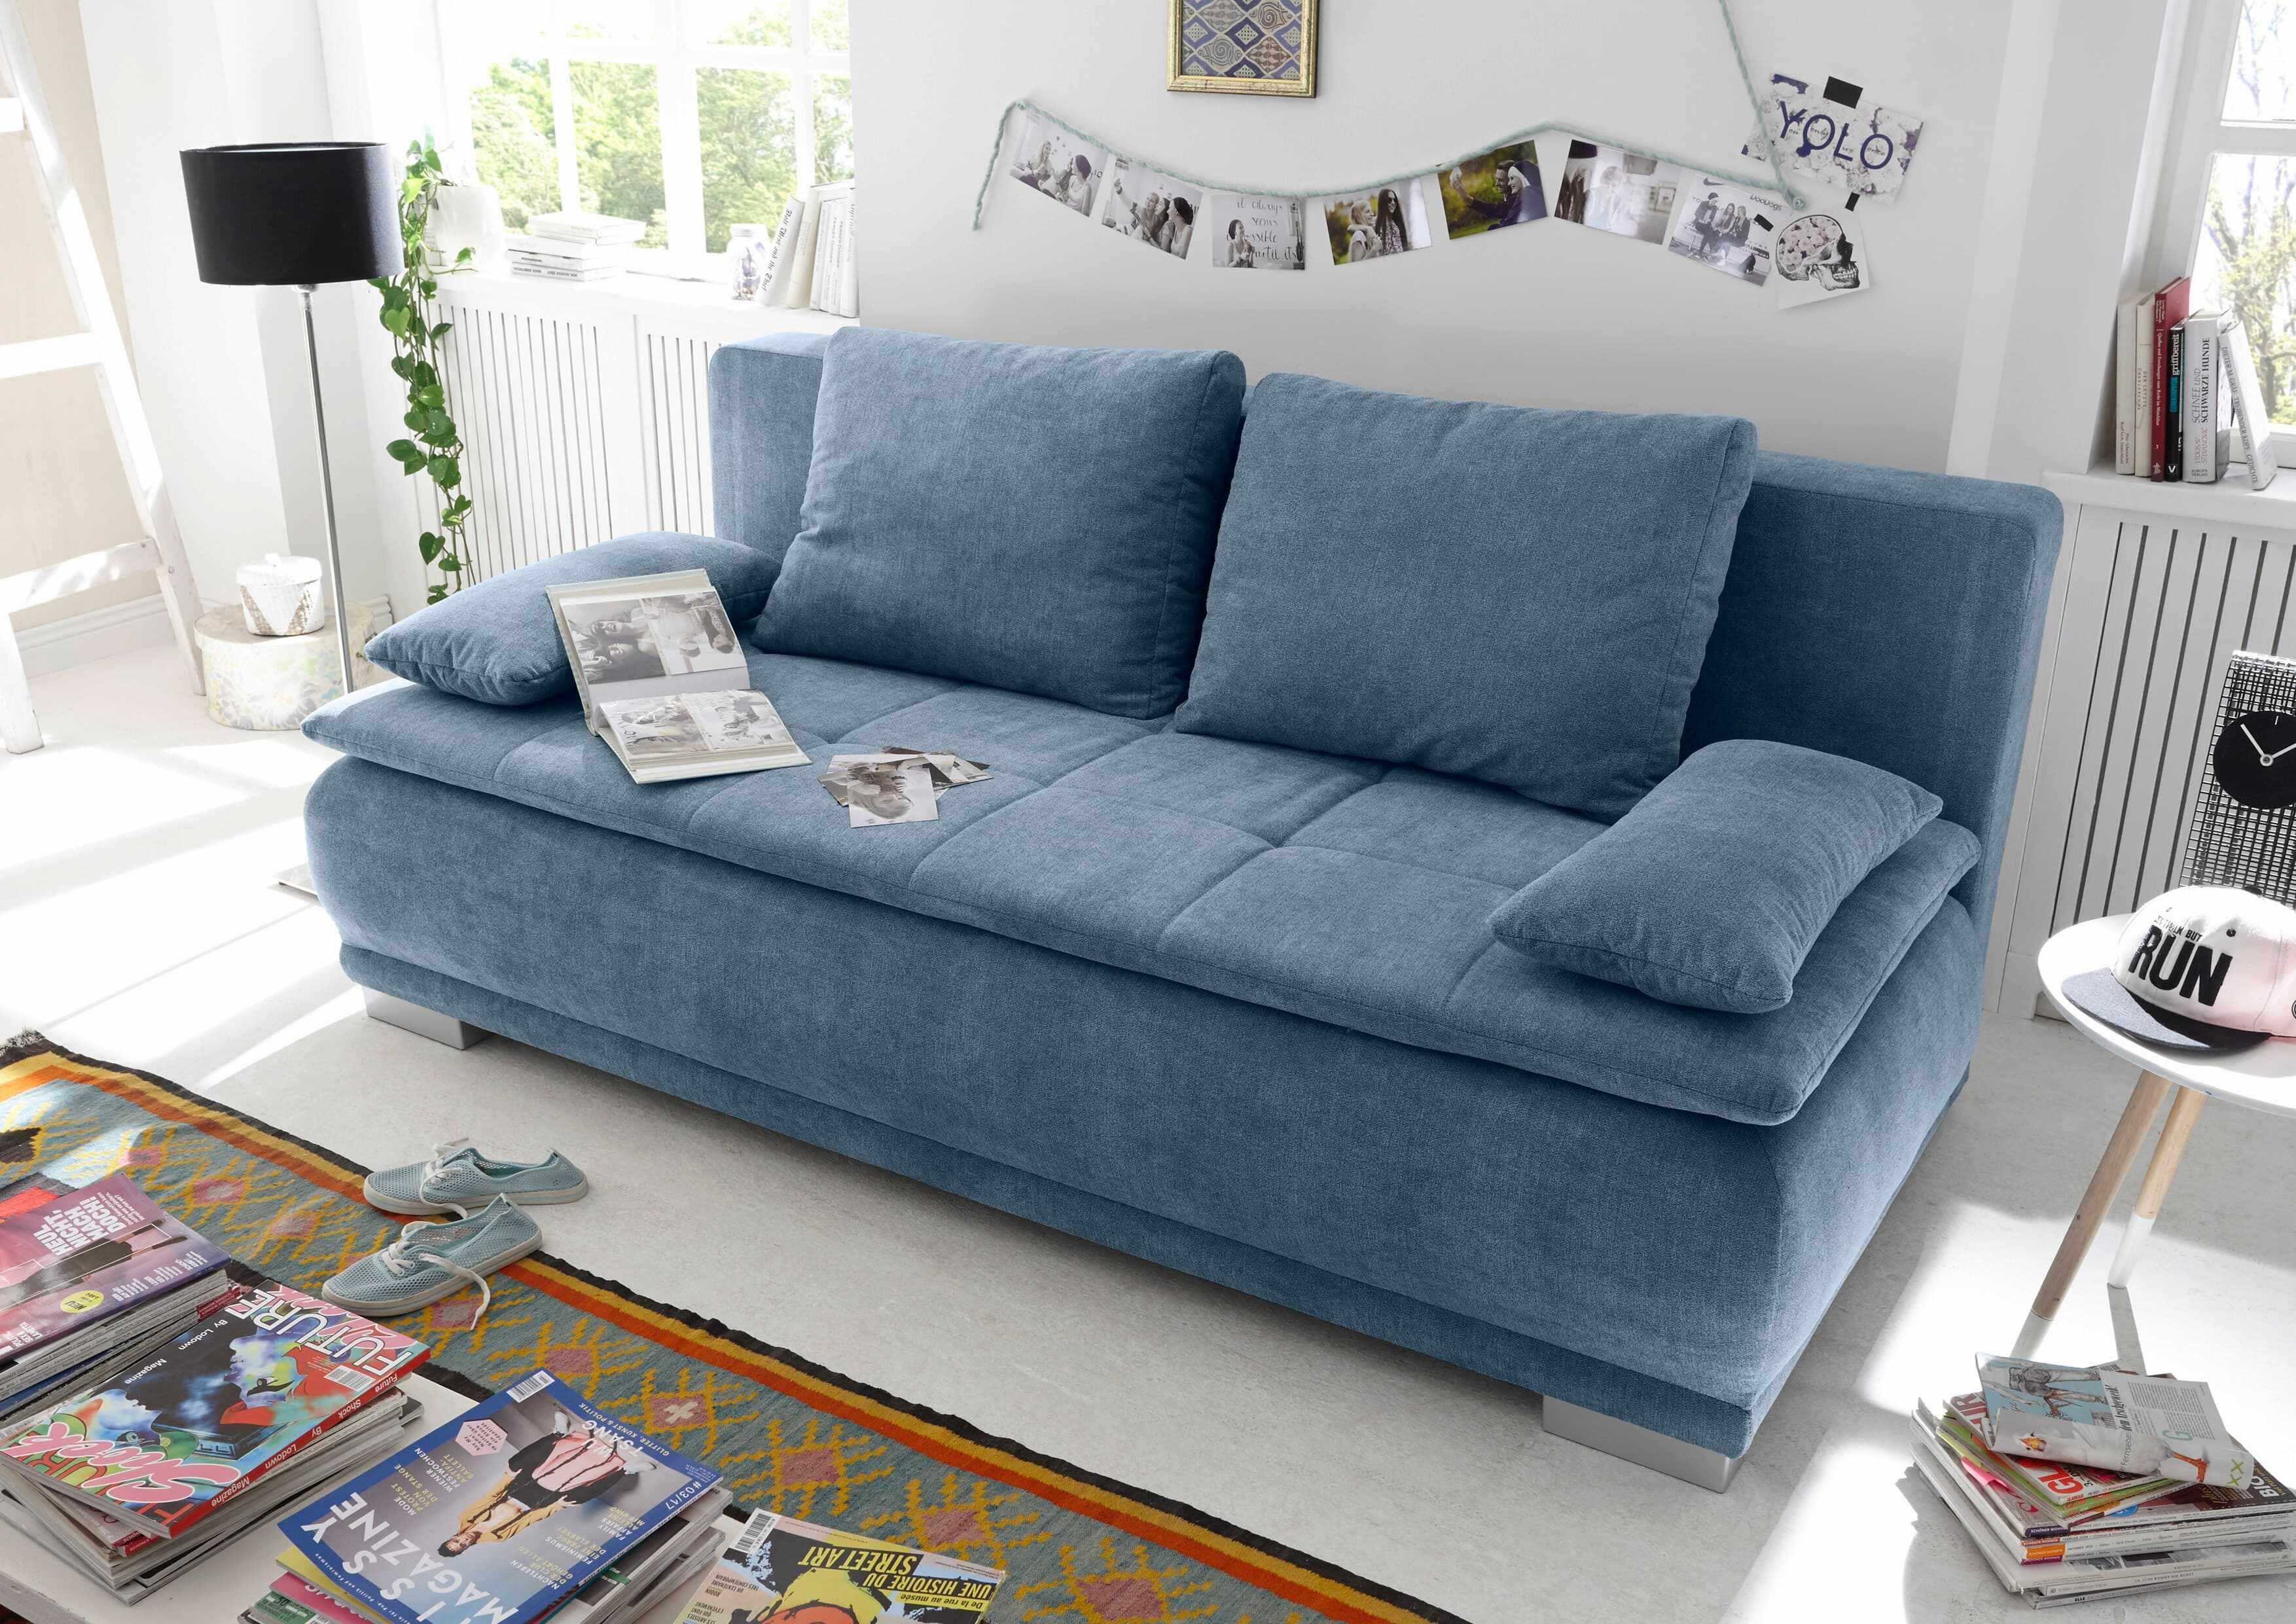 Canapea extensibila cu lada de depozitare, tapitata cu stofa, 3 locuri, Lois Albastru, l211xA103xH93 cm la pret 3145 lei